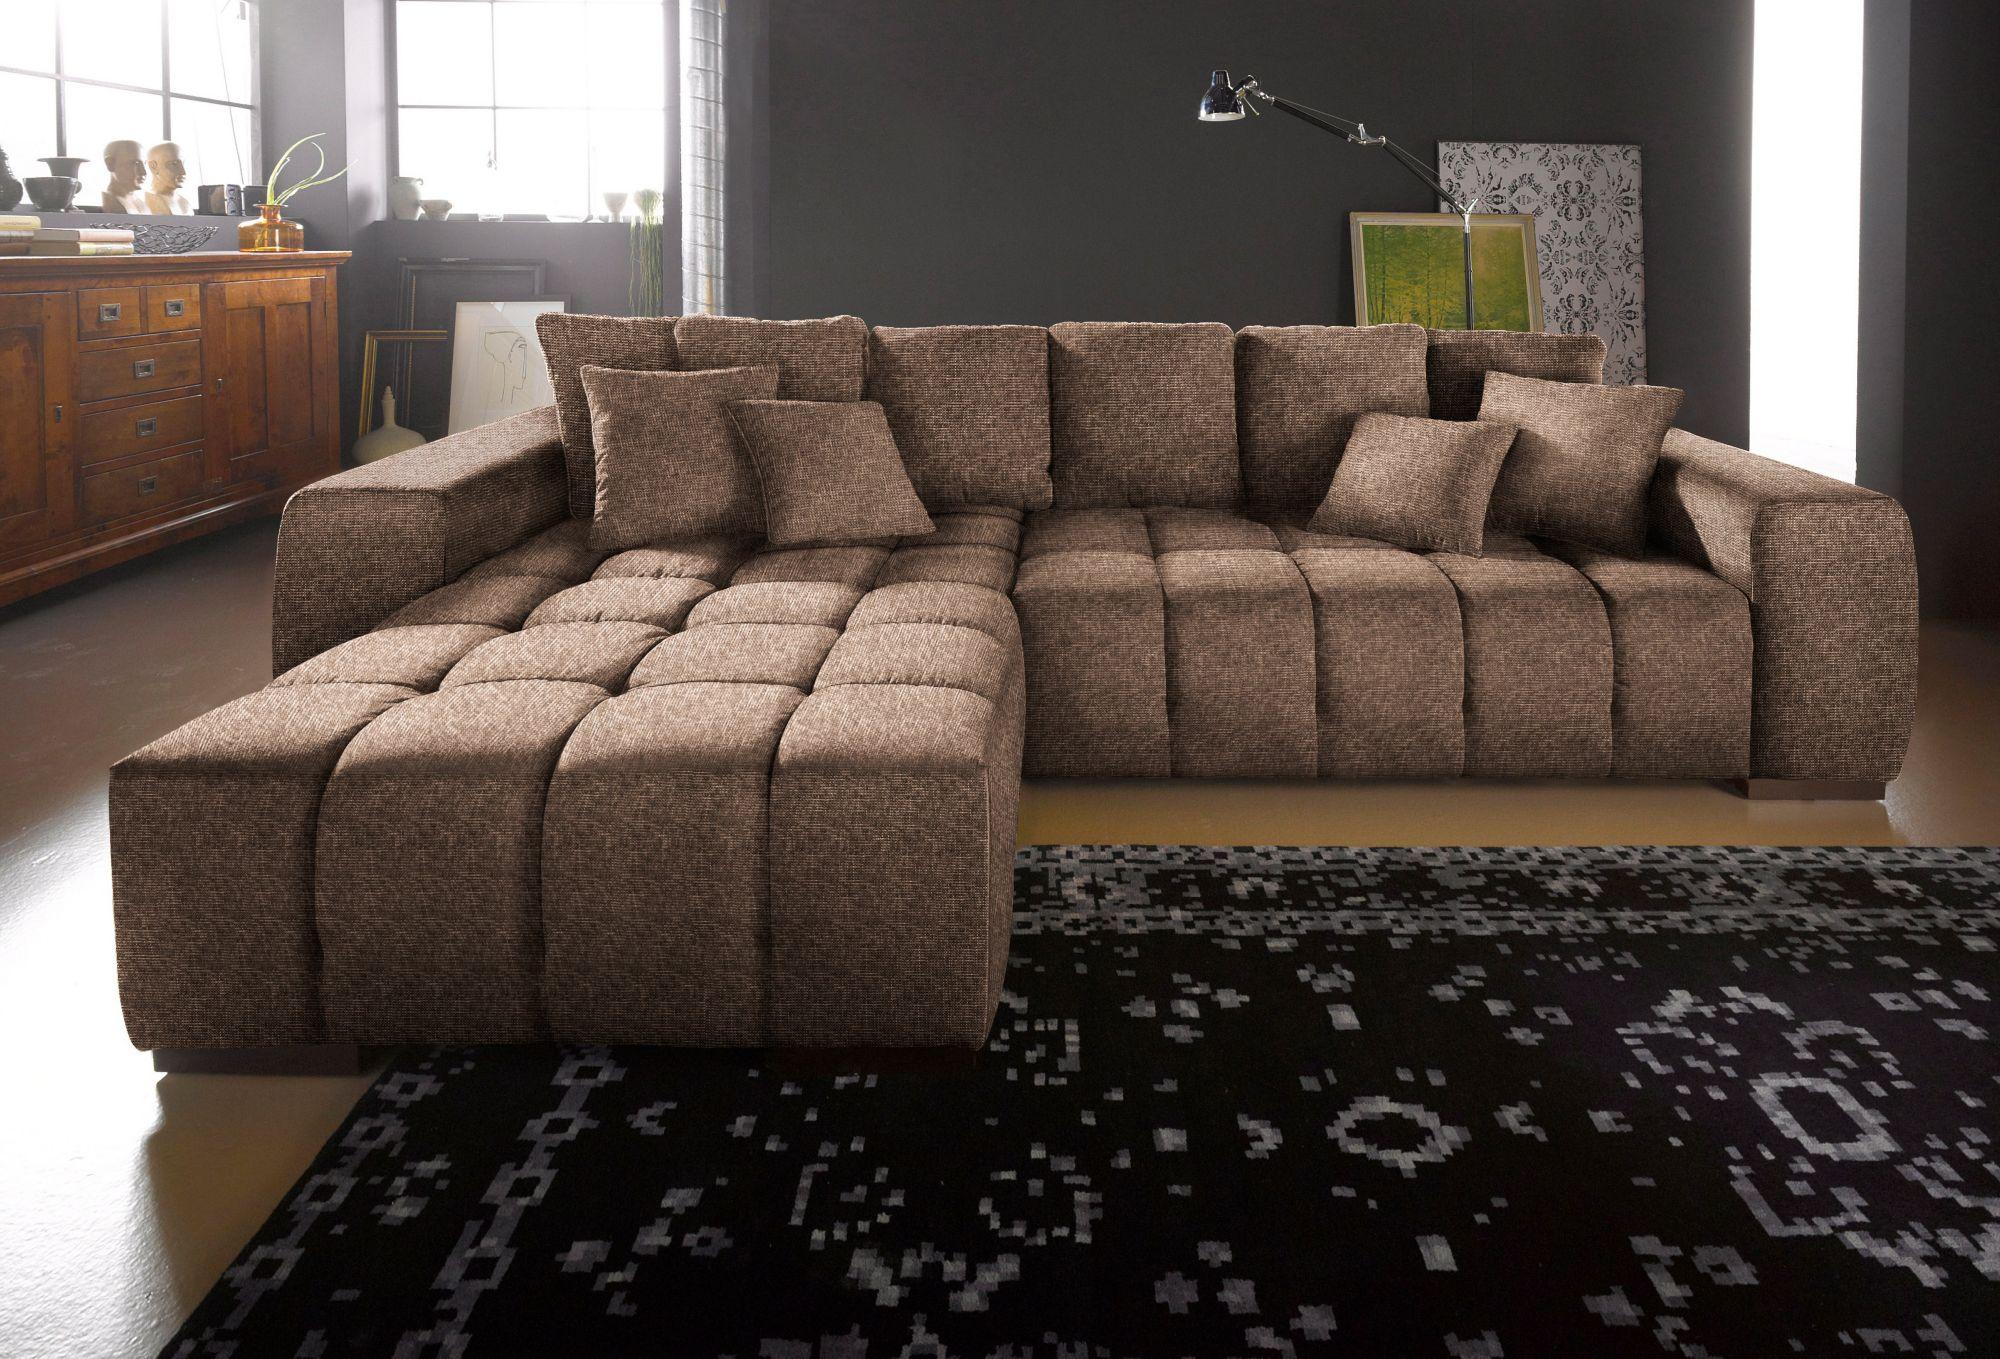 polsterecke wahlweise mit soundsystem schwab versand. Black Bedroom Furniture Sets. Home Design Ideas